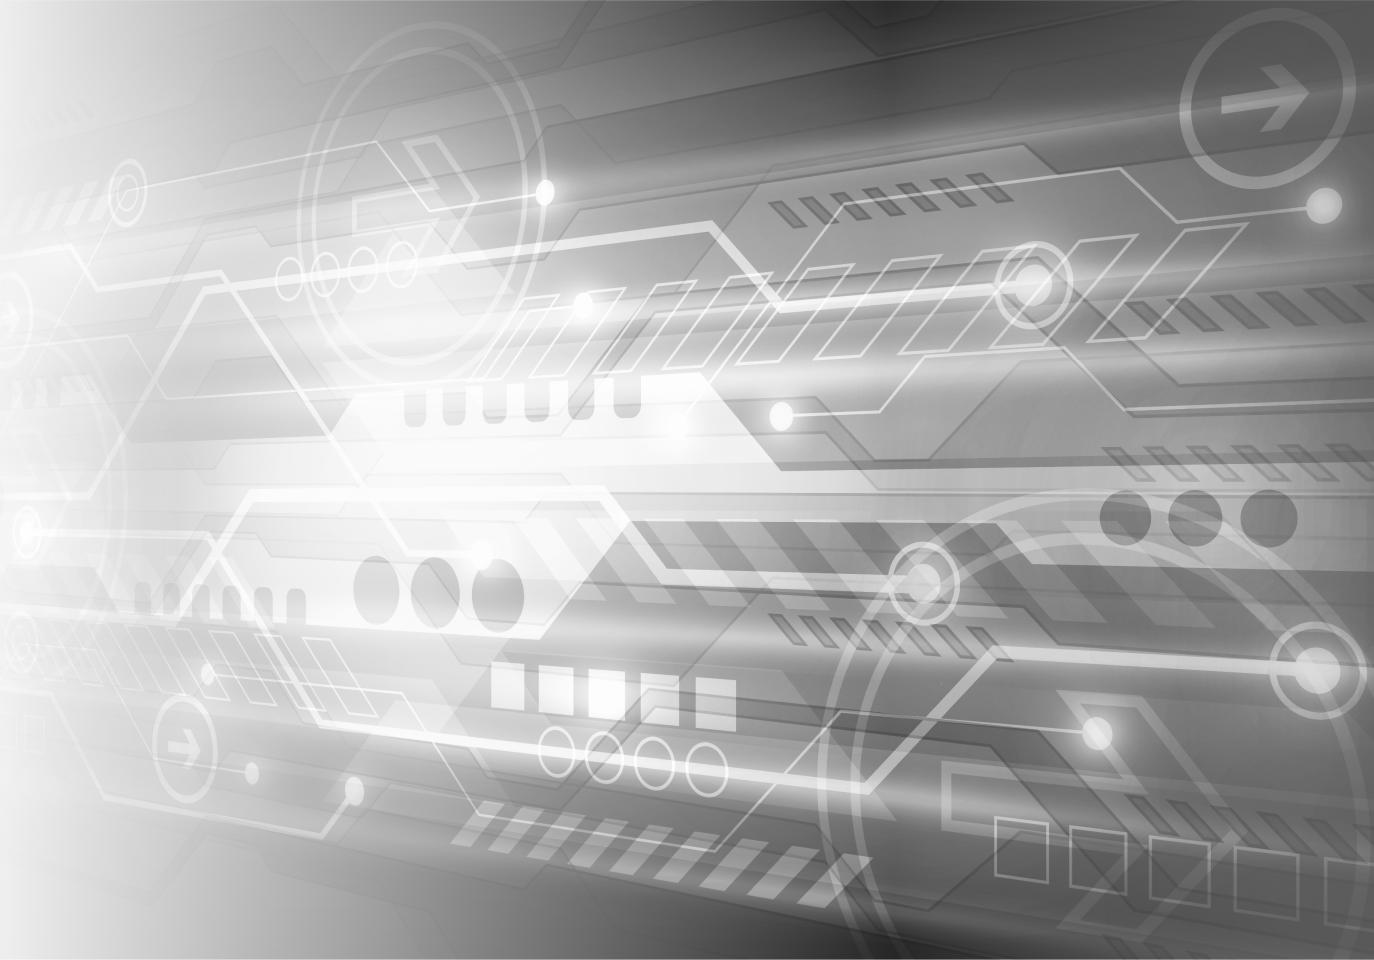 Xenoss - SSP and ad network software development - hero image